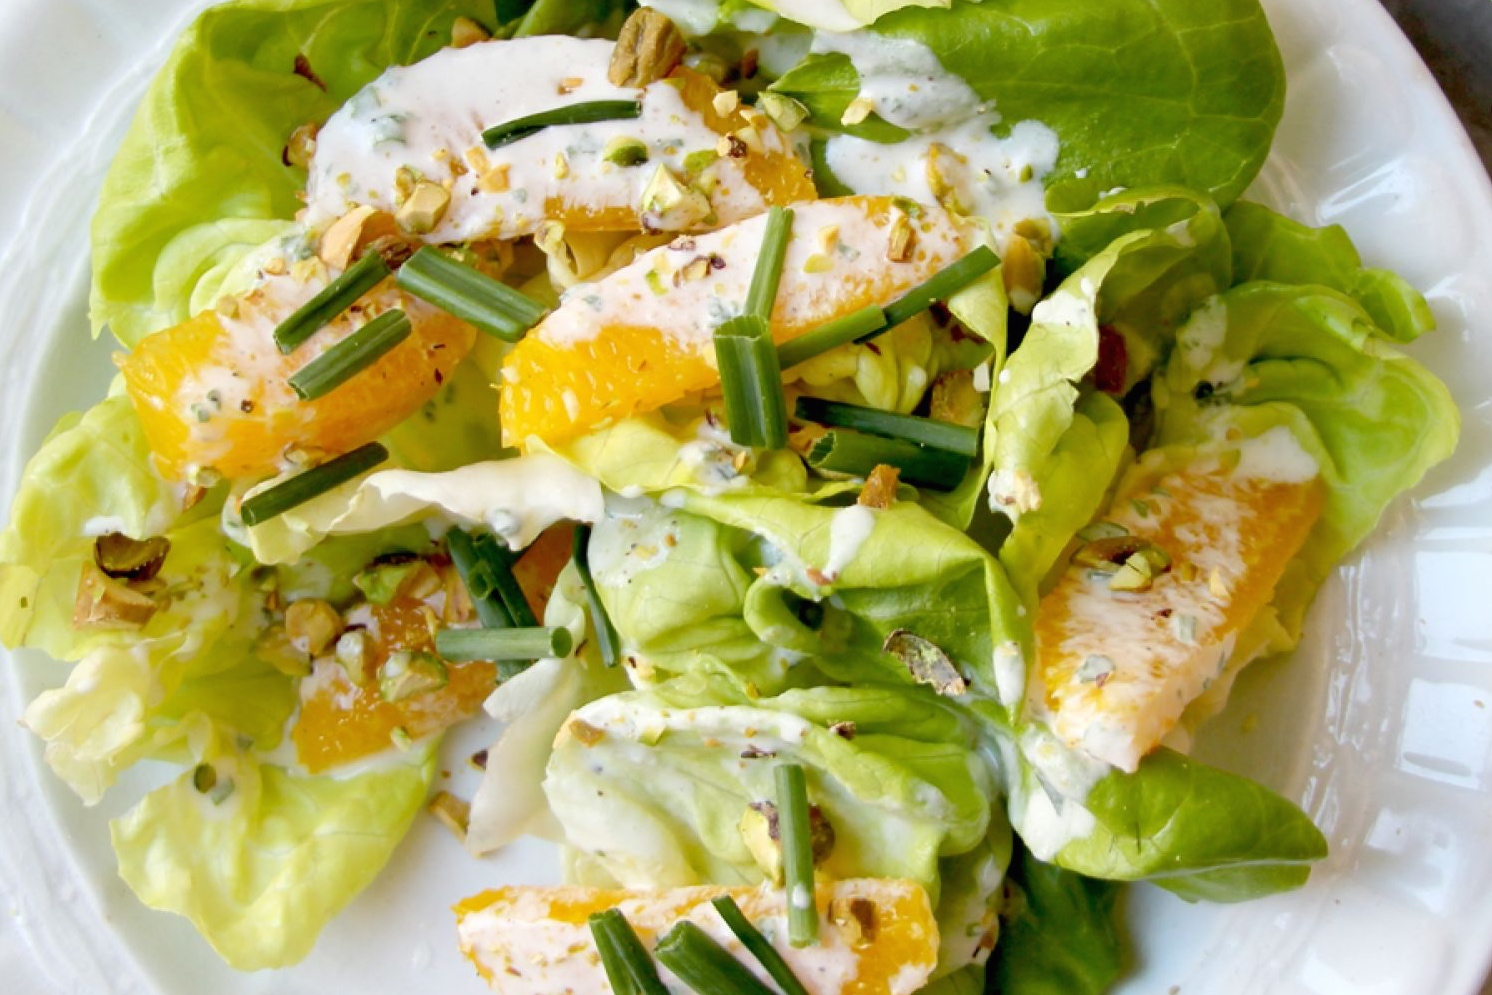 Image result for Butter Lettuce Salad with Pistachios and Orange Crème Fraîche Dressing